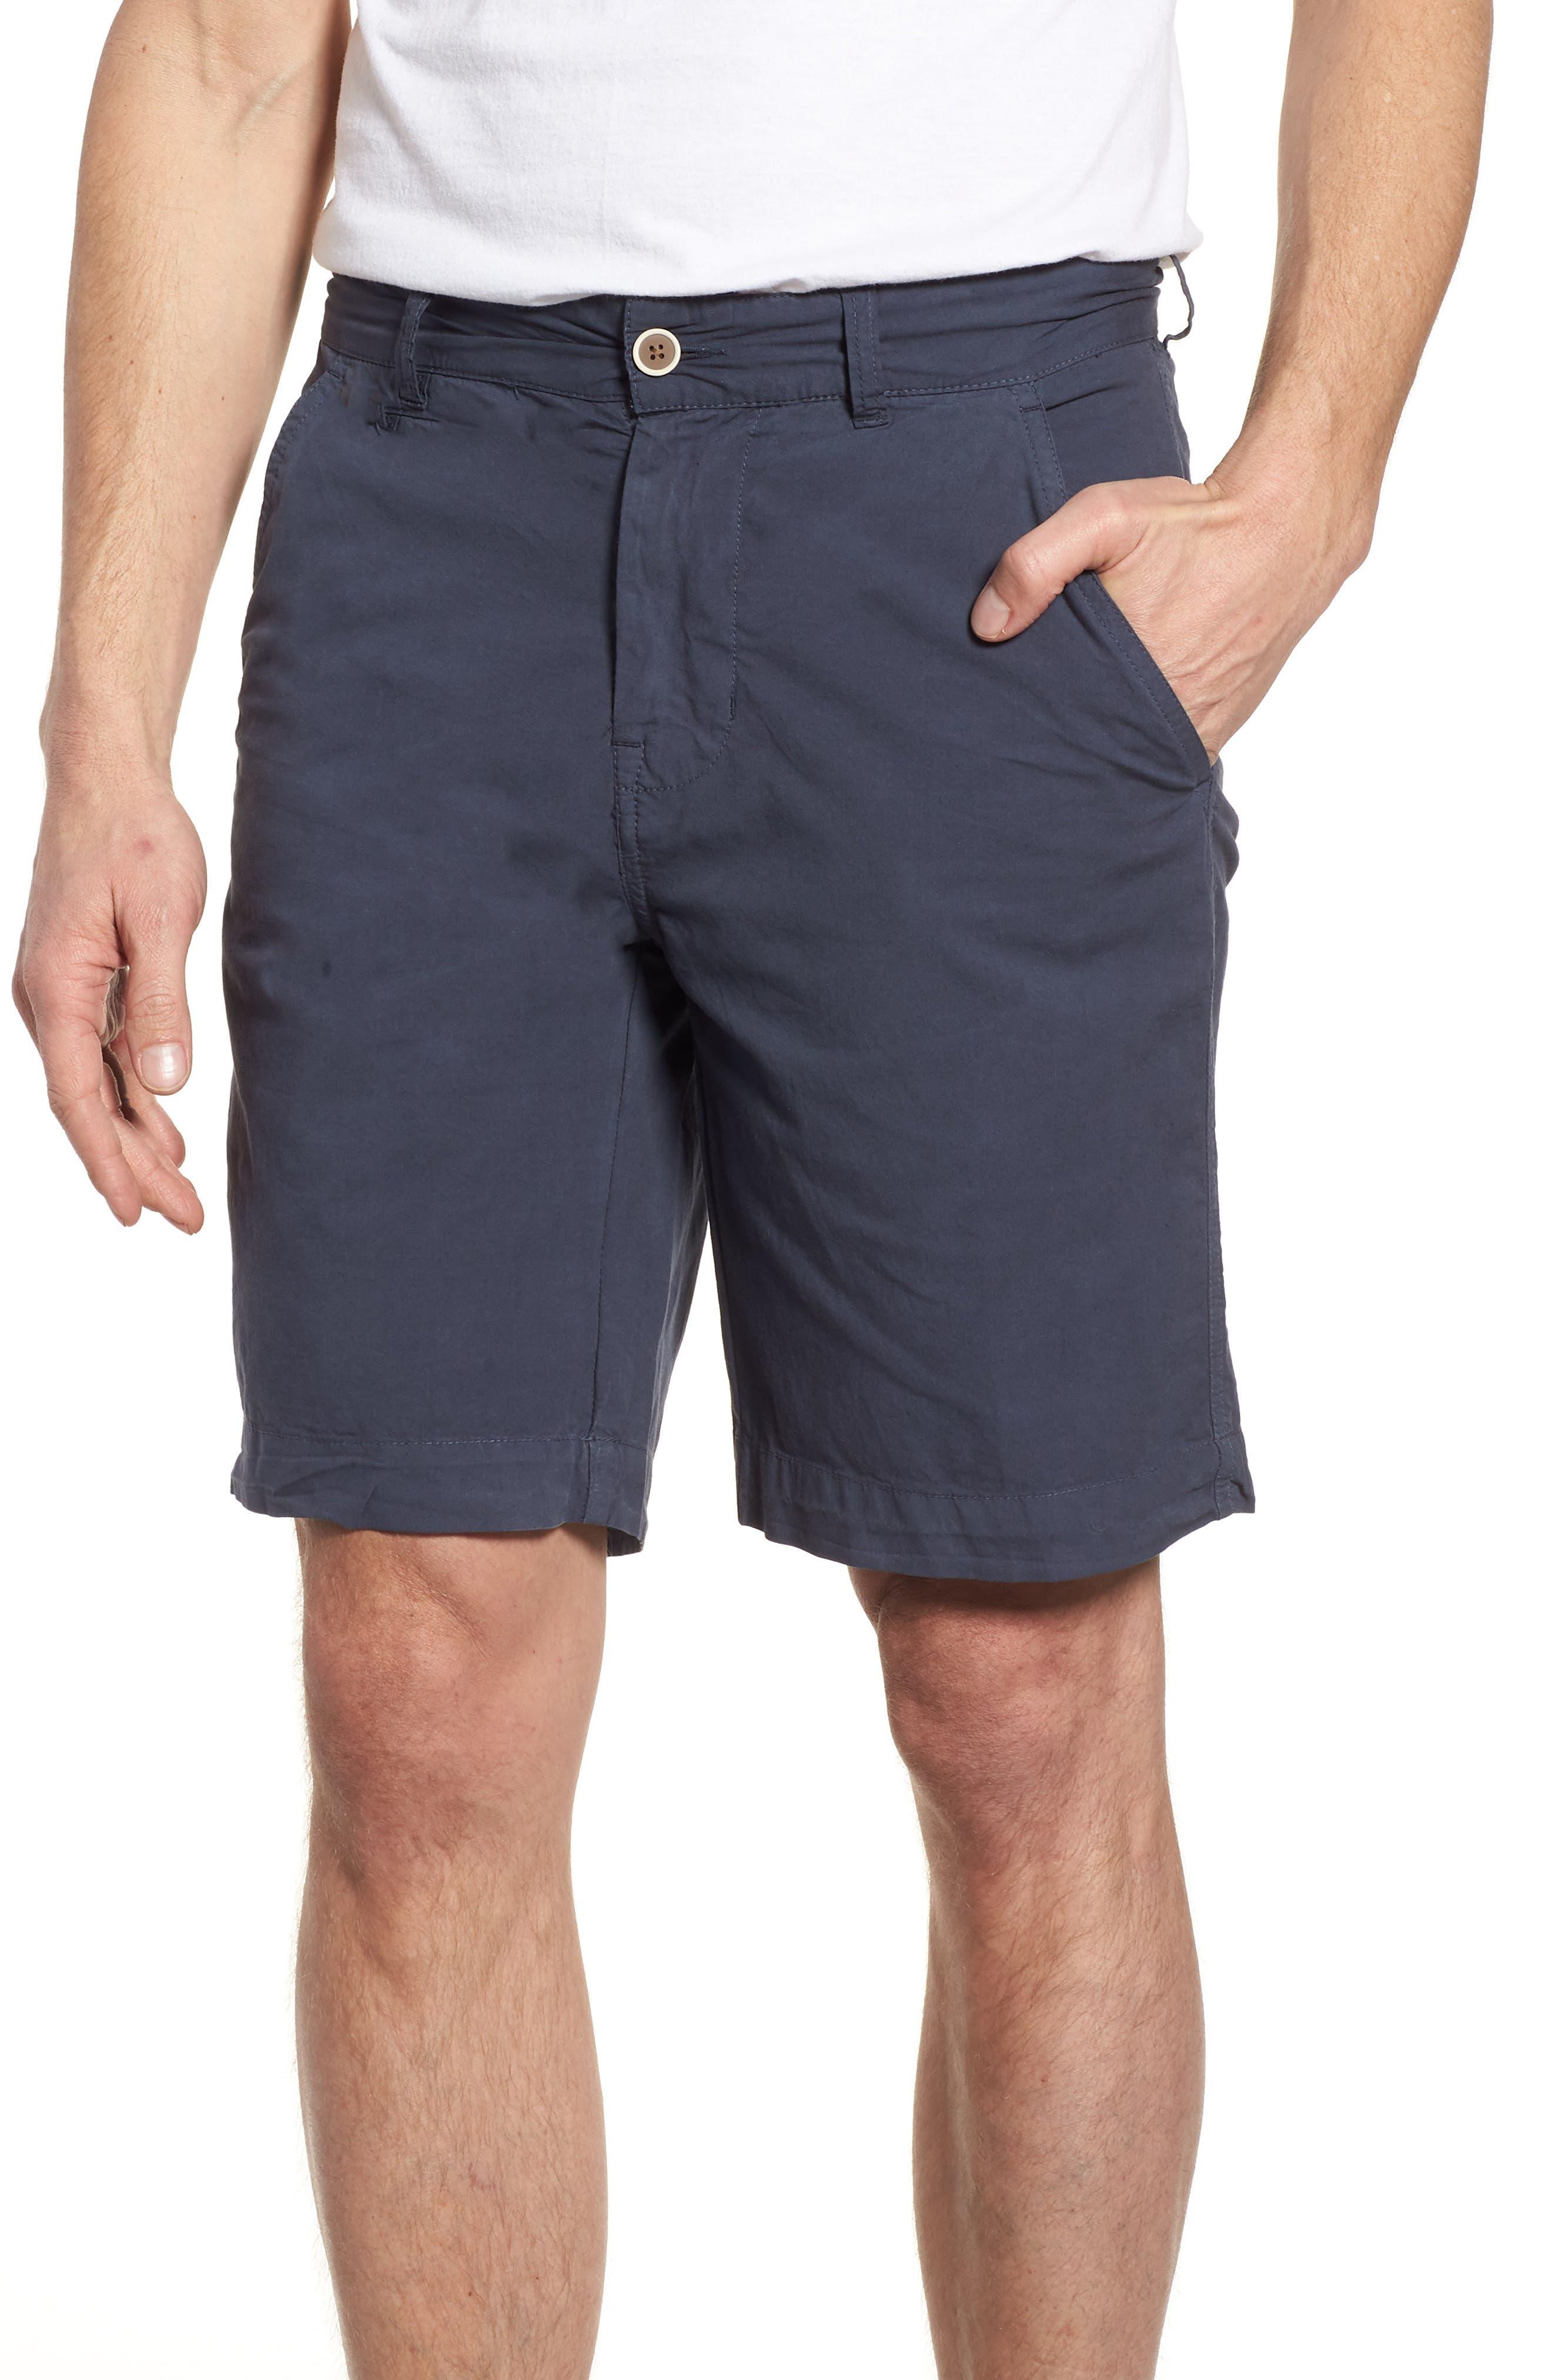 Stretch Poplin Shorts,                             Main thumbnail 1, color,                             Navy